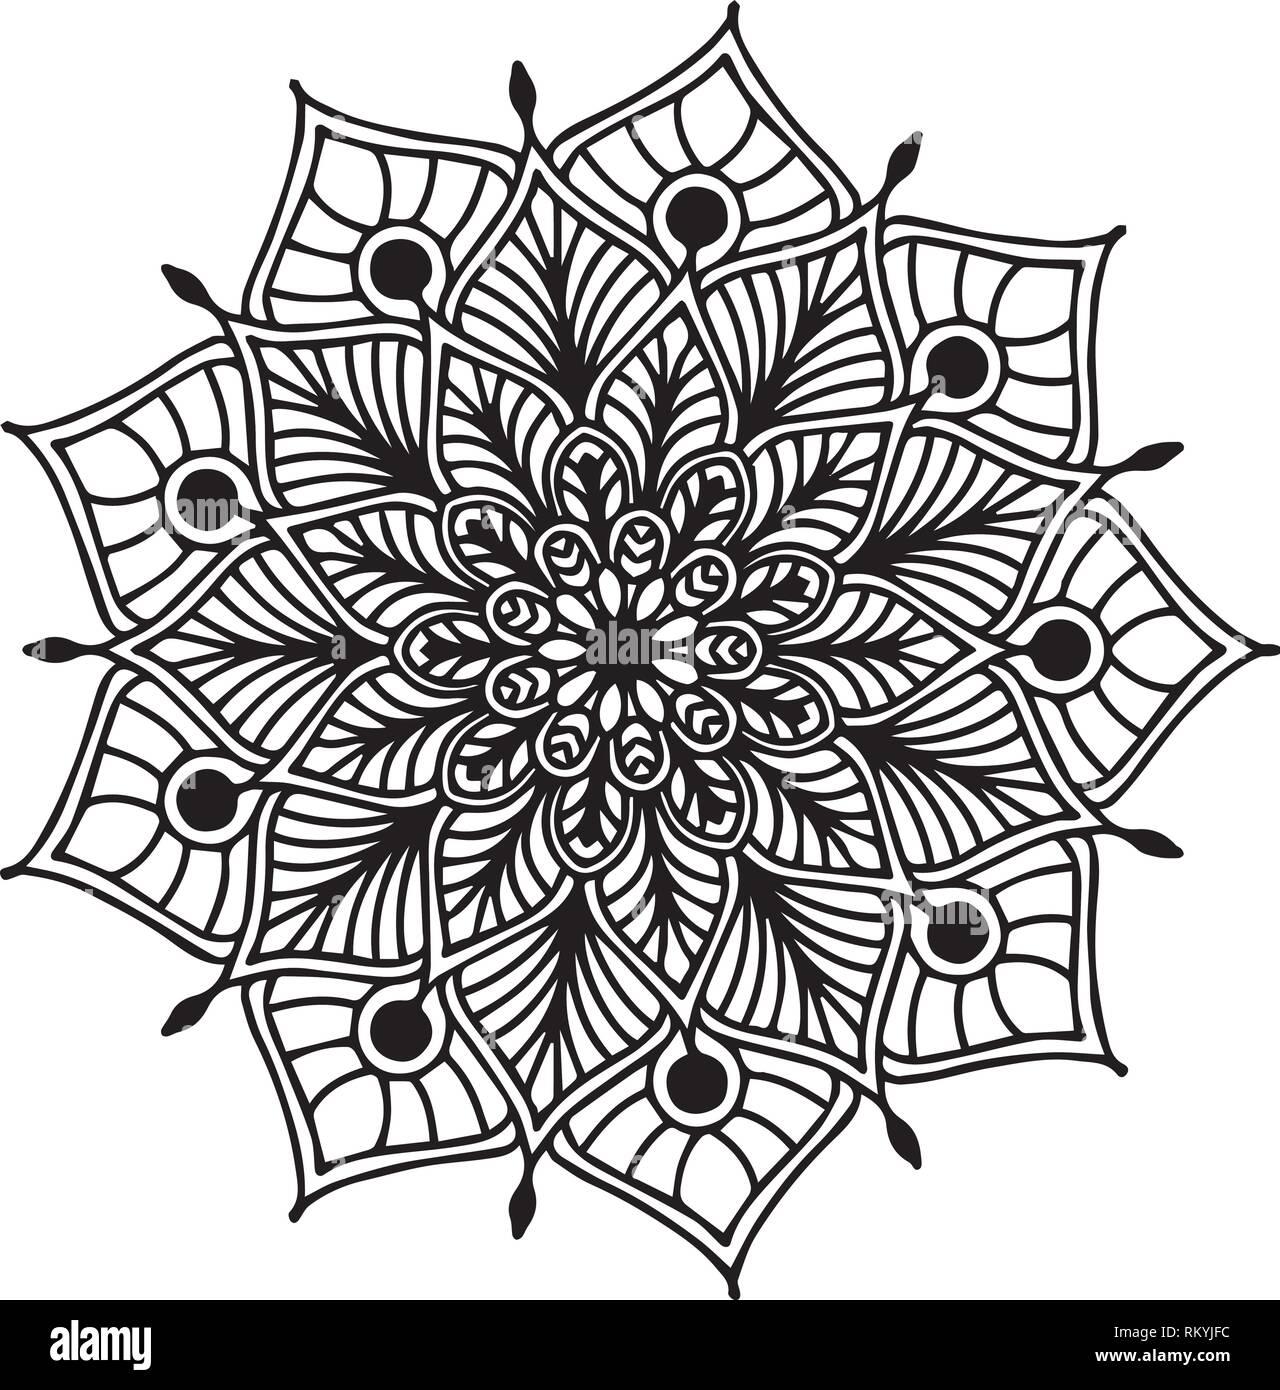 Mandalas coloring book, Oriental therapy, Yoga logos Vector Stock ...